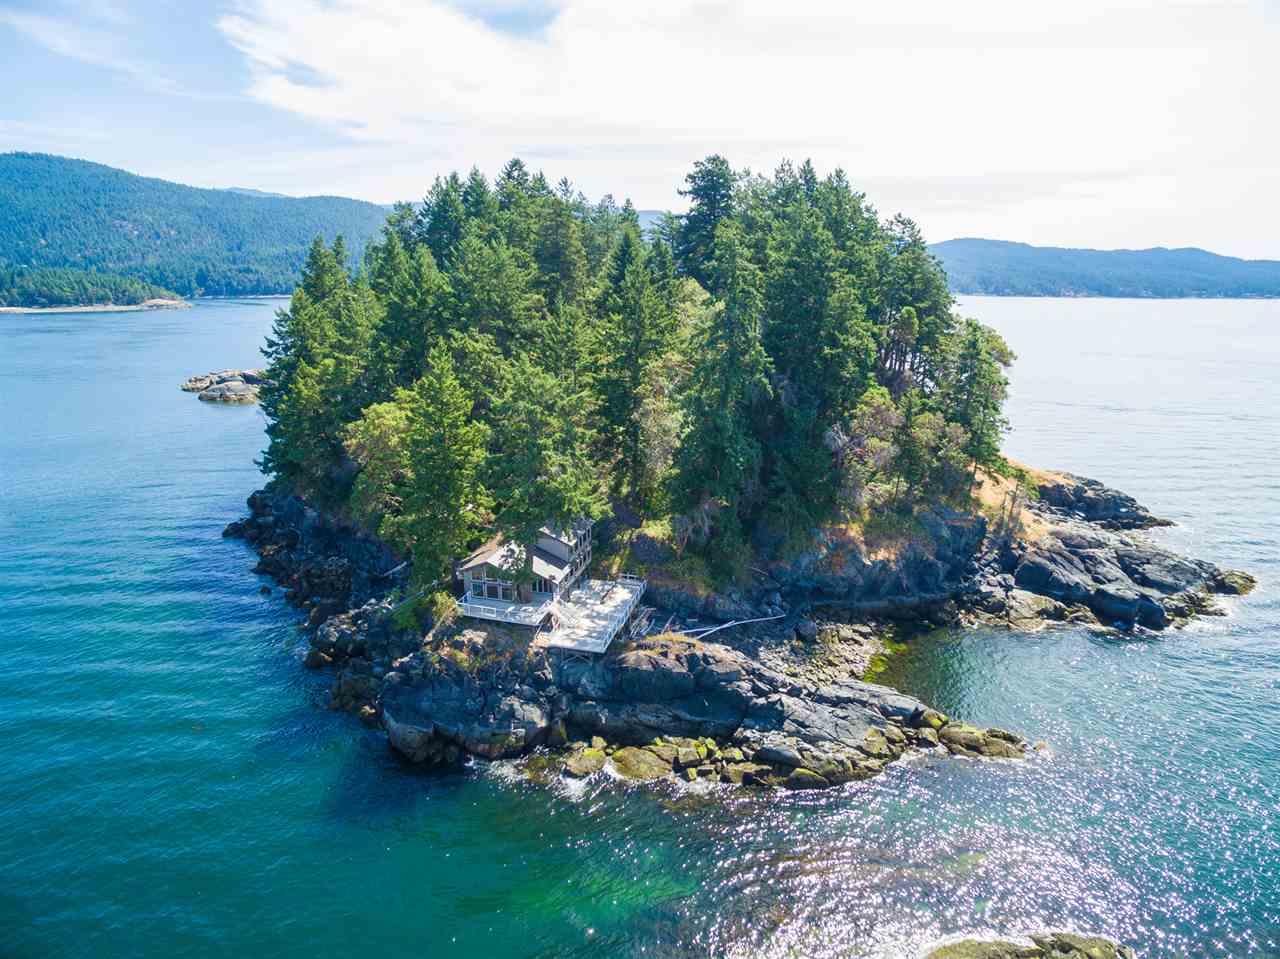 Recreational at 12401 WHITESTONE ROAD, Sunshine Coast, British Columbia. Image 1